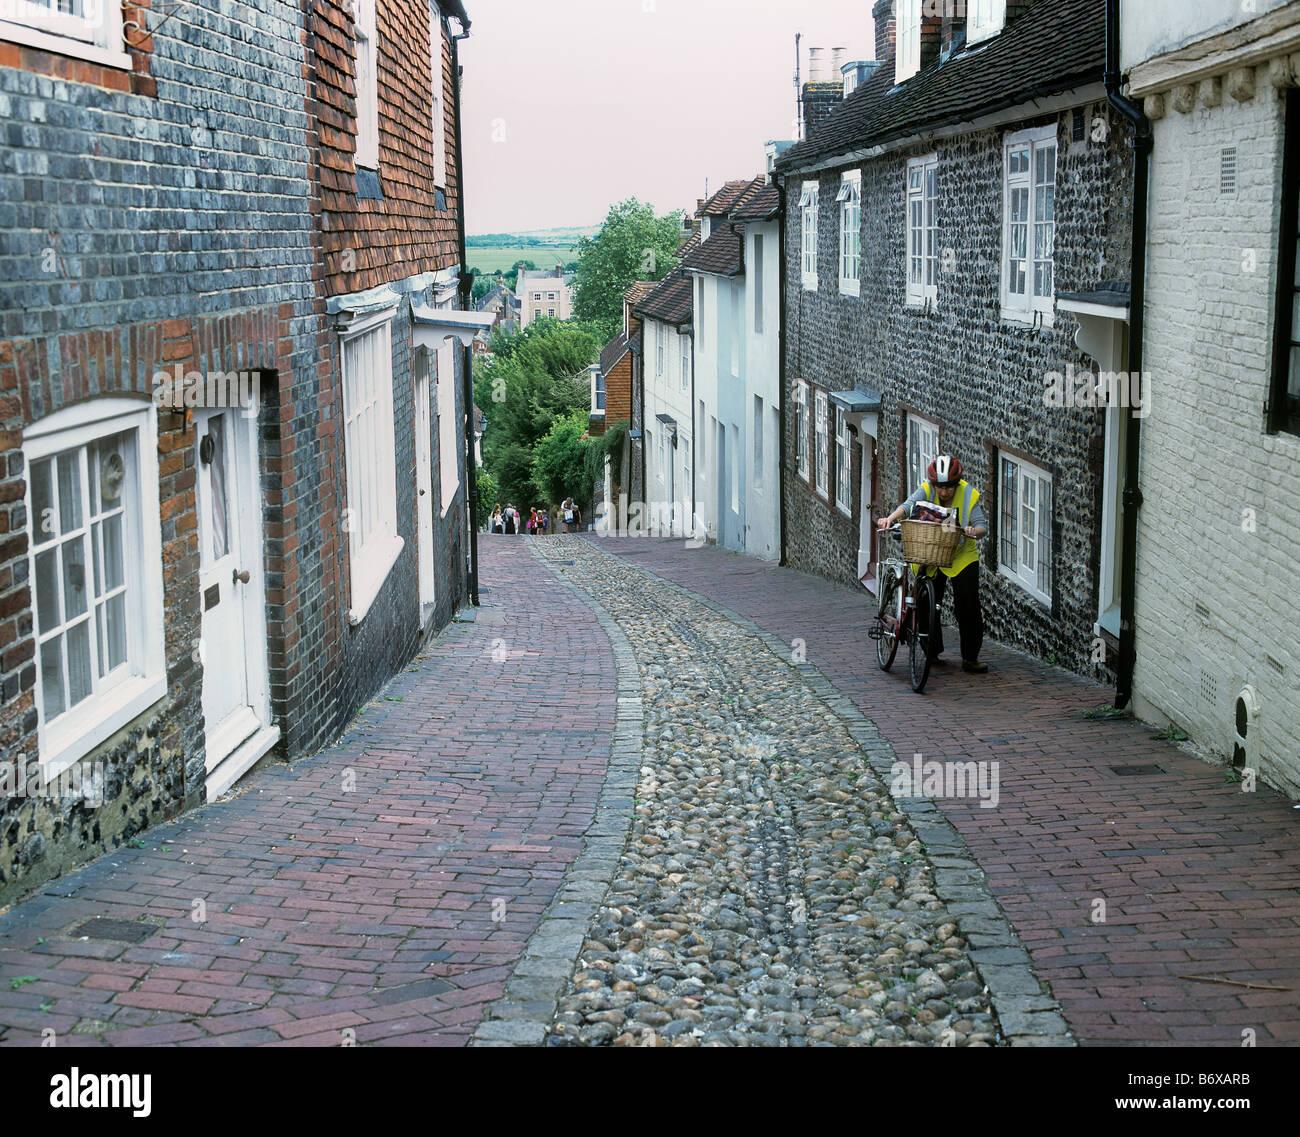 Keere St. Lewes, East Sussex. Stock Photo